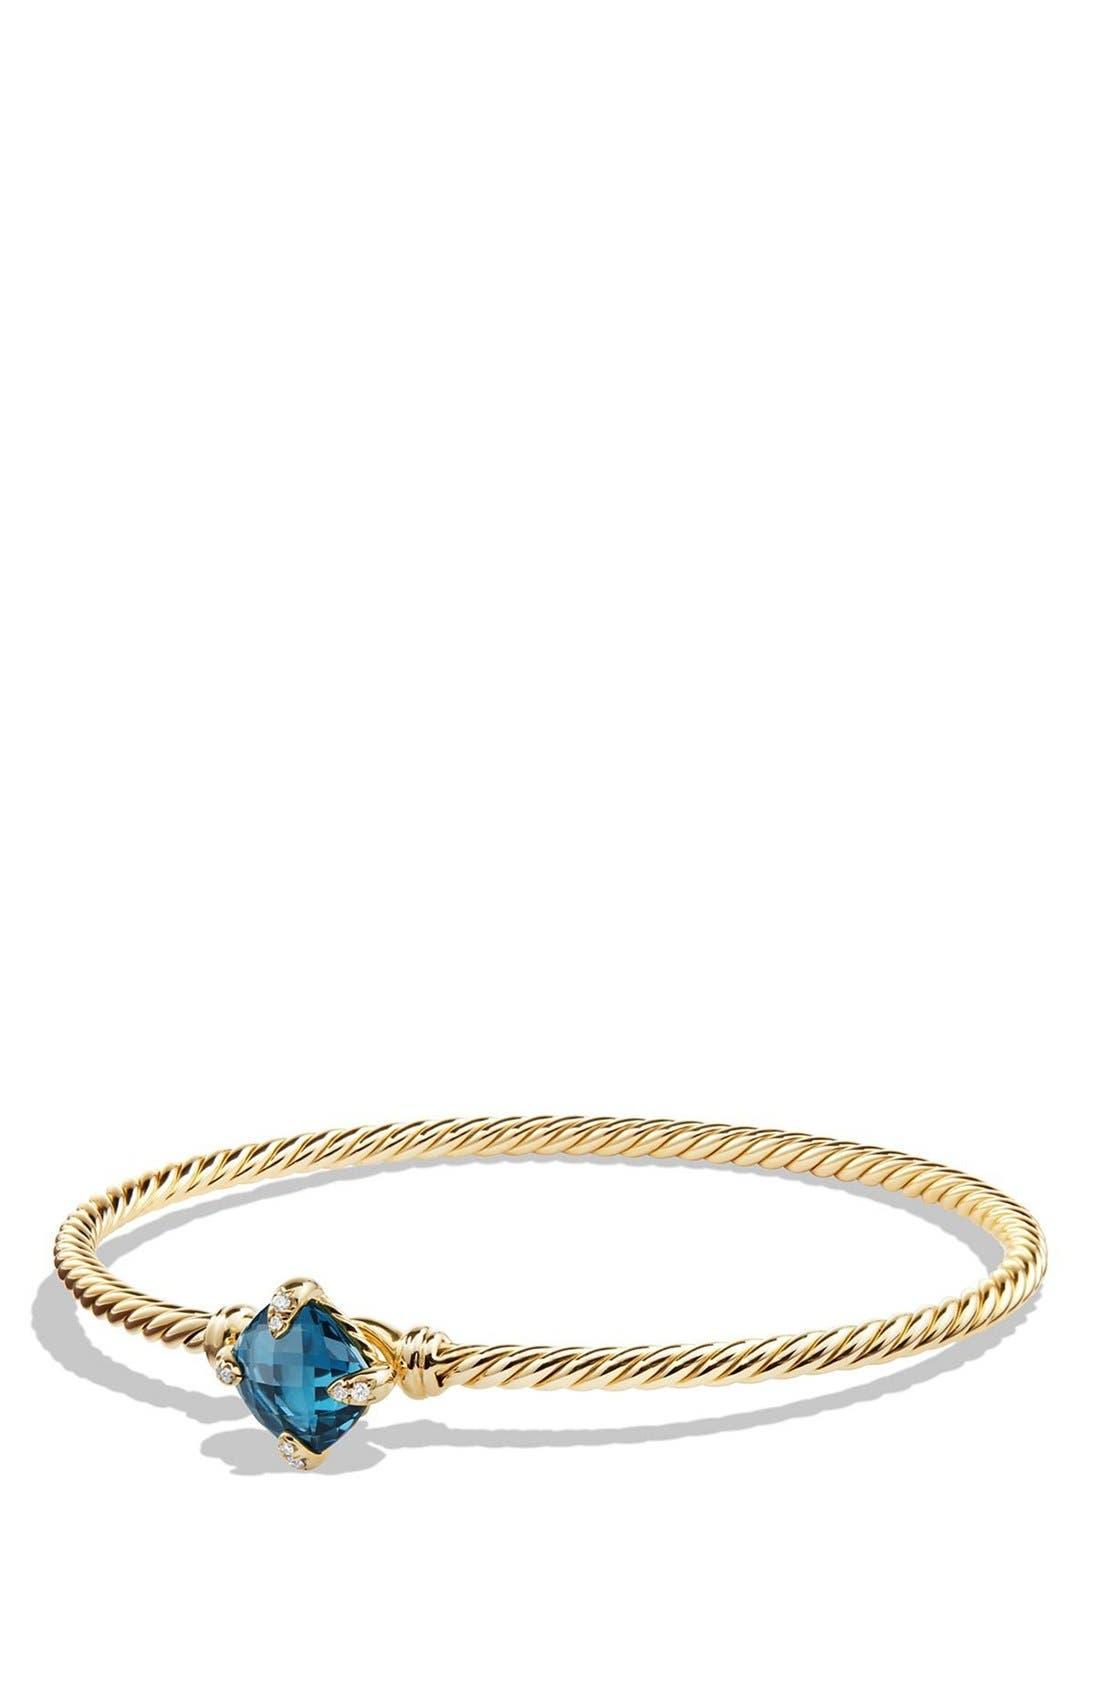 DAVID YURMAN Châtelaine Bracelet in 18K Gold with Diamonds